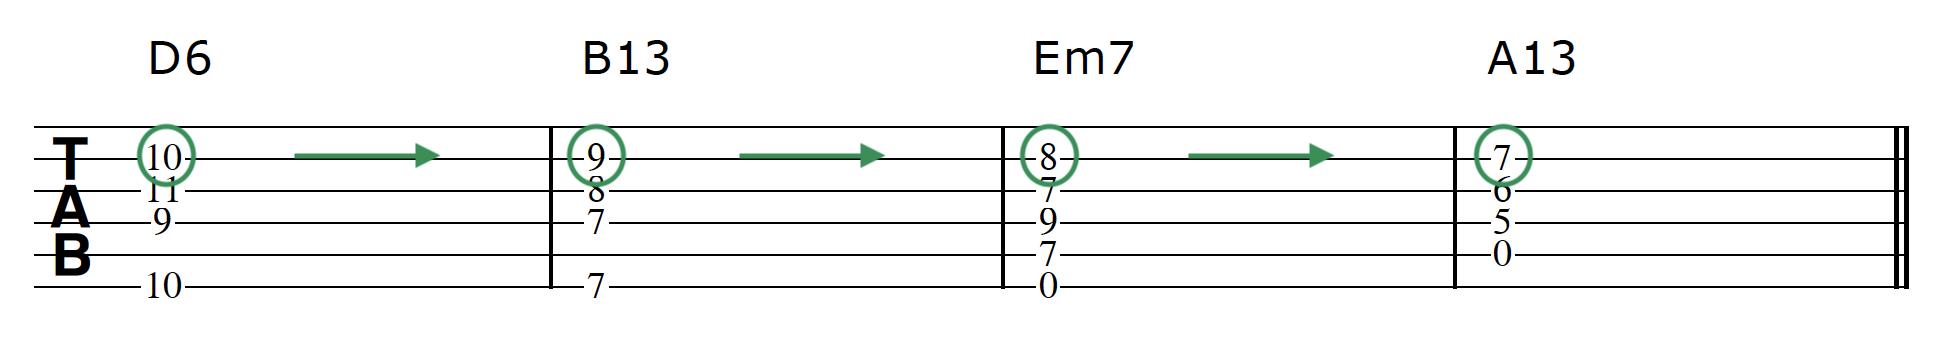 Advanced Guitar Chords Progression 2 Chord 4